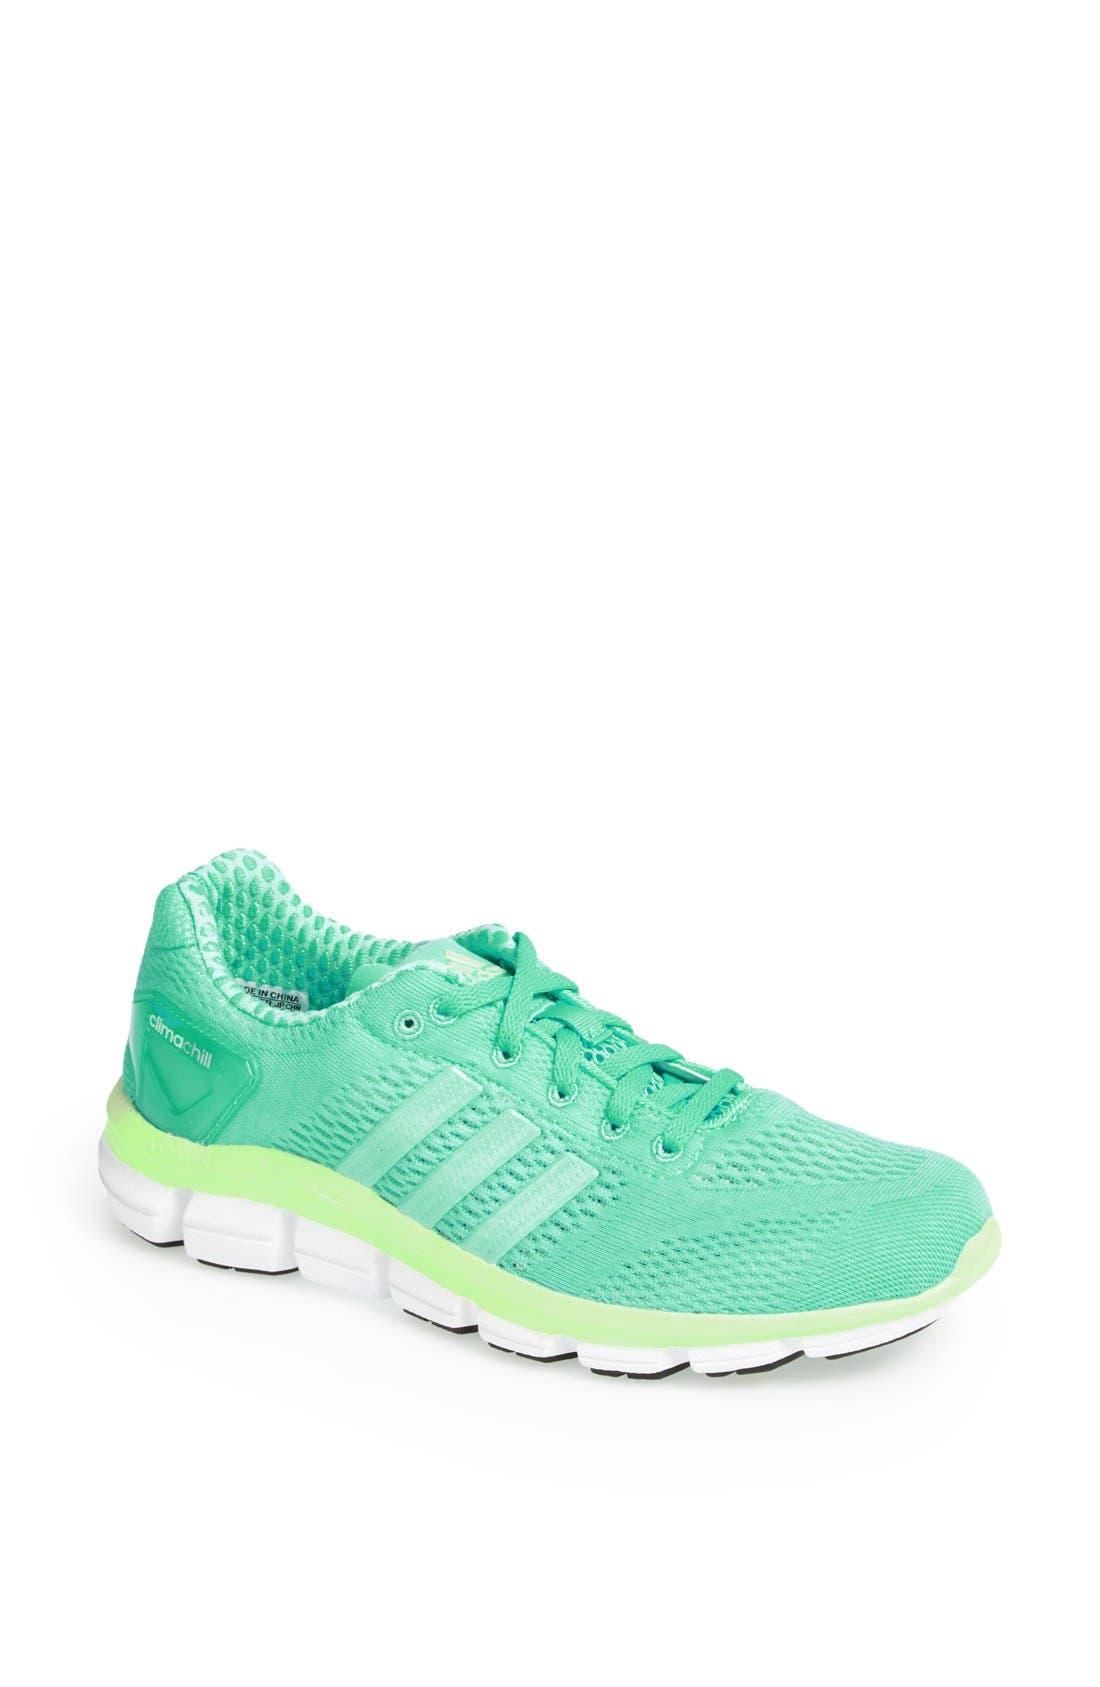 Main Image - adidas 'CC Ride' Running Shoes (Women)